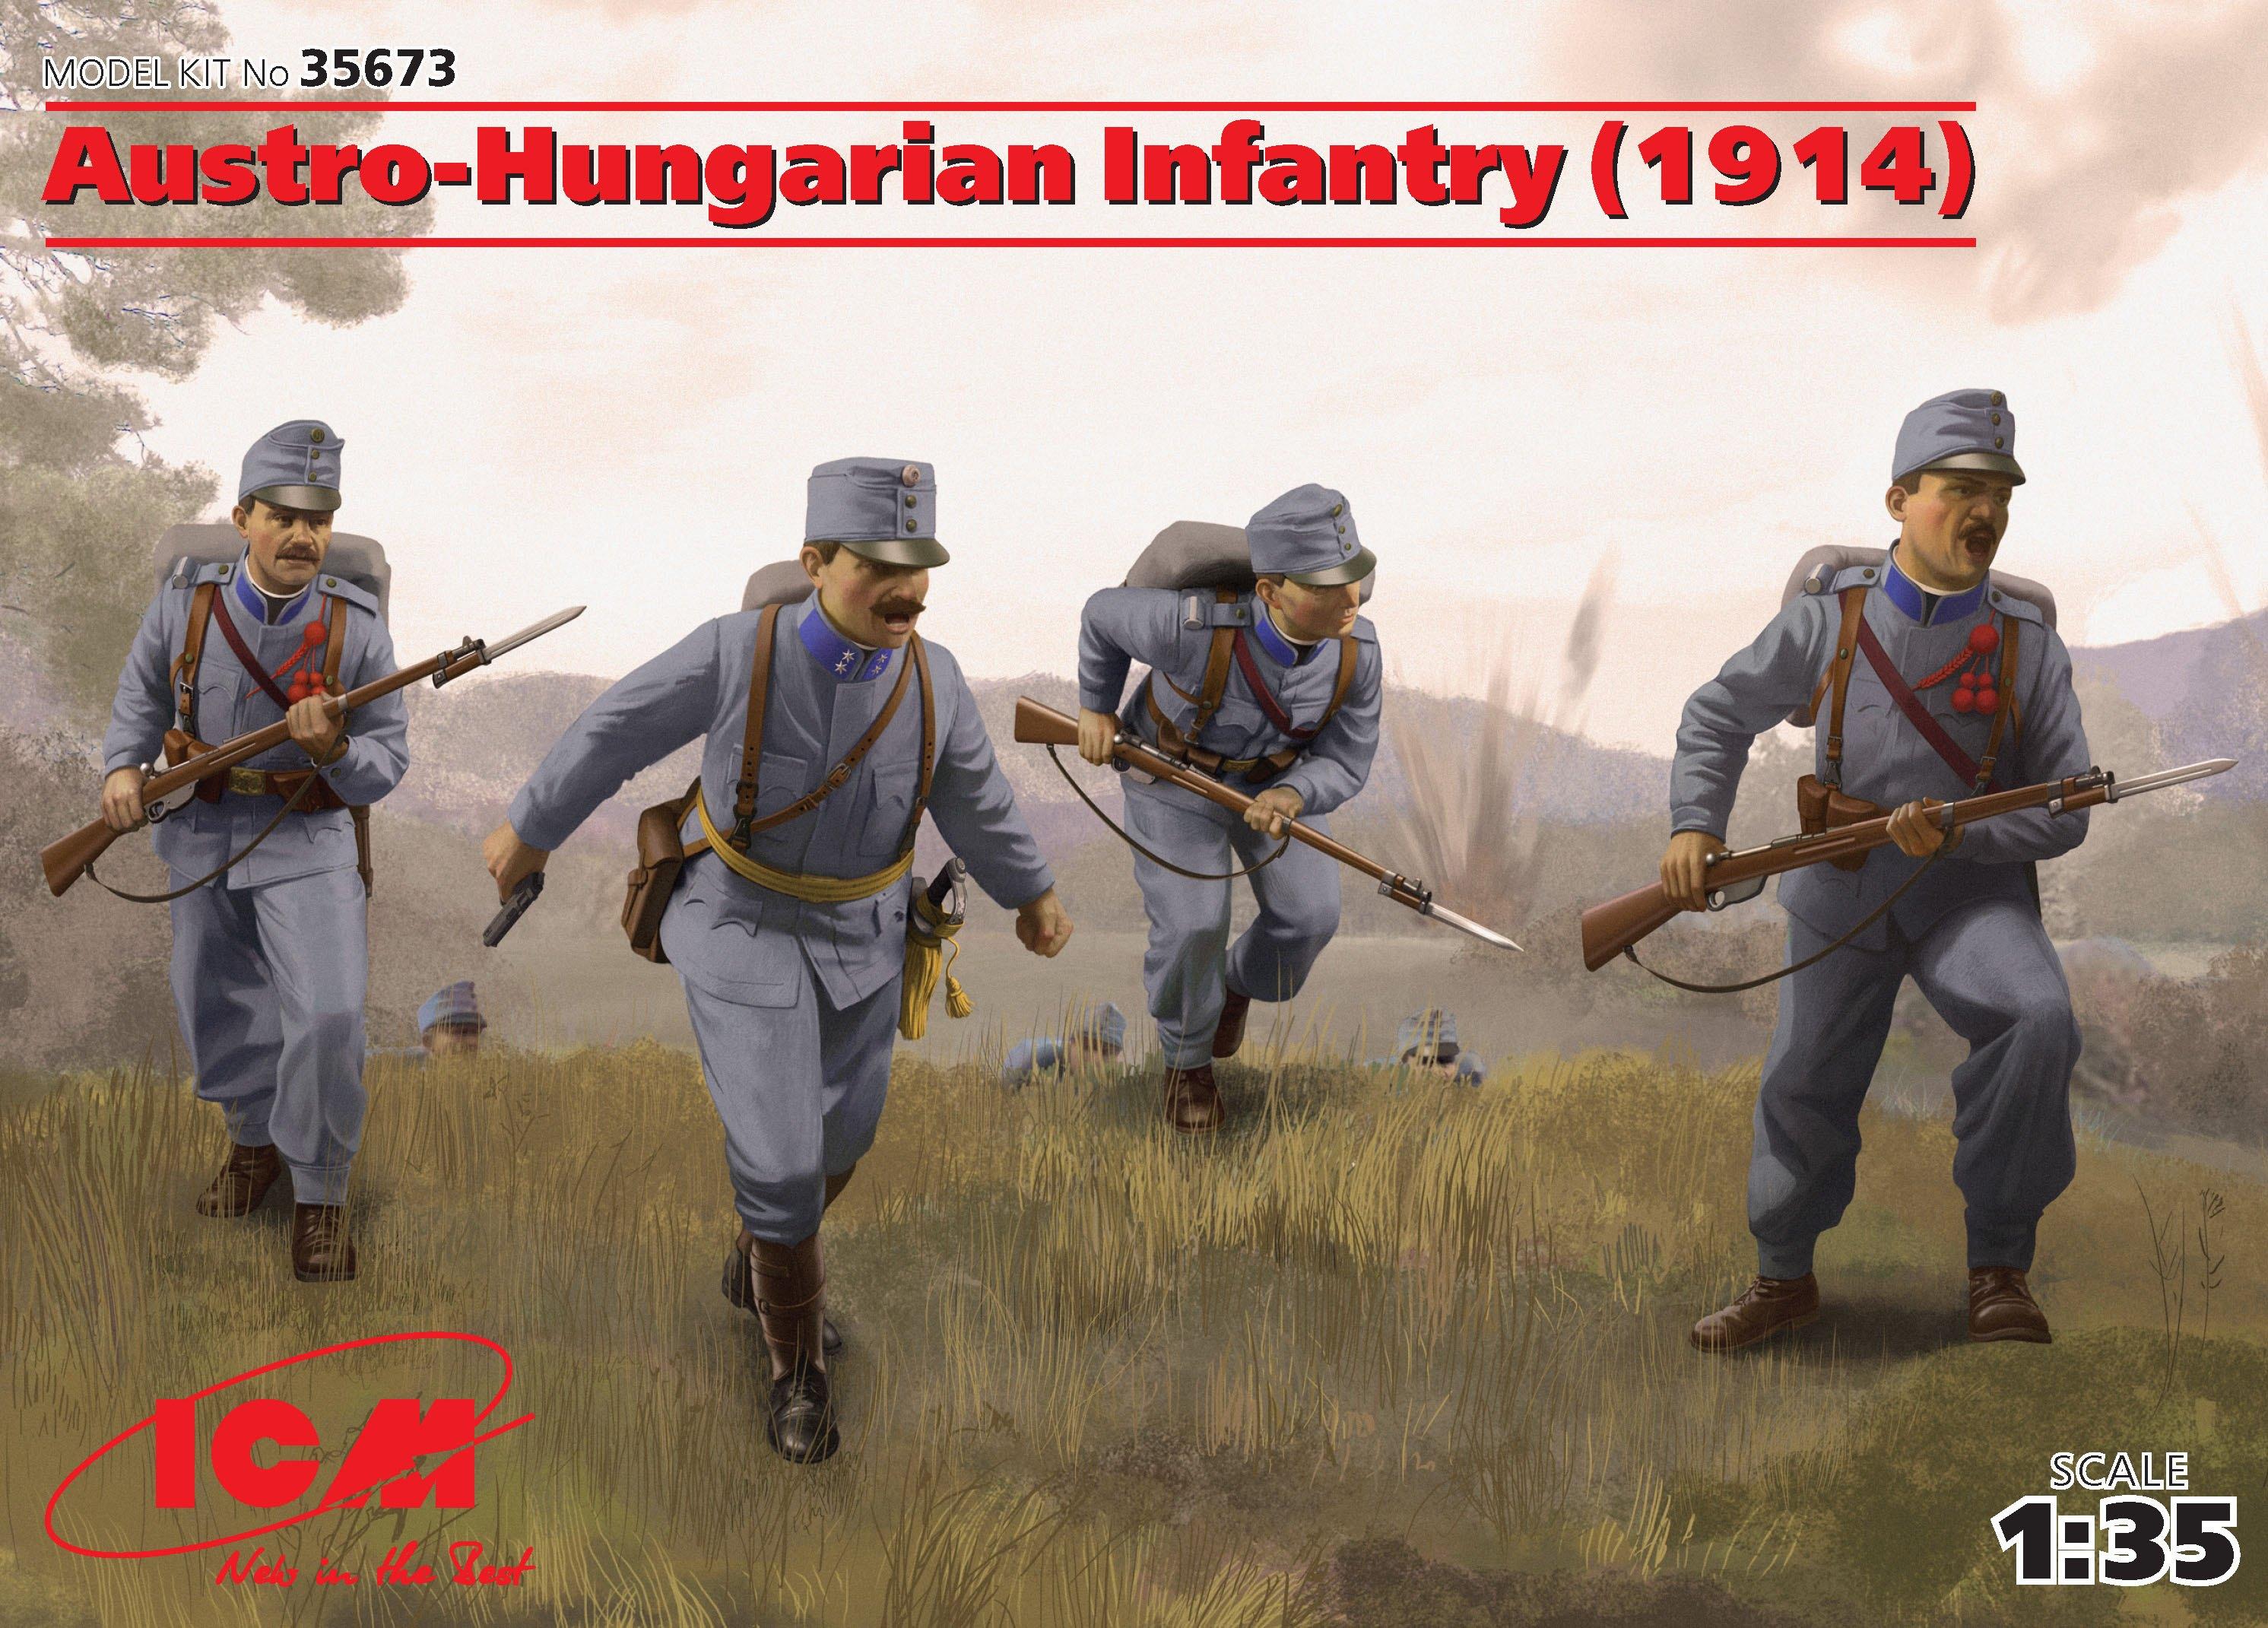 ICM Austro-Hungarian Infantry (1914) (4 figures)